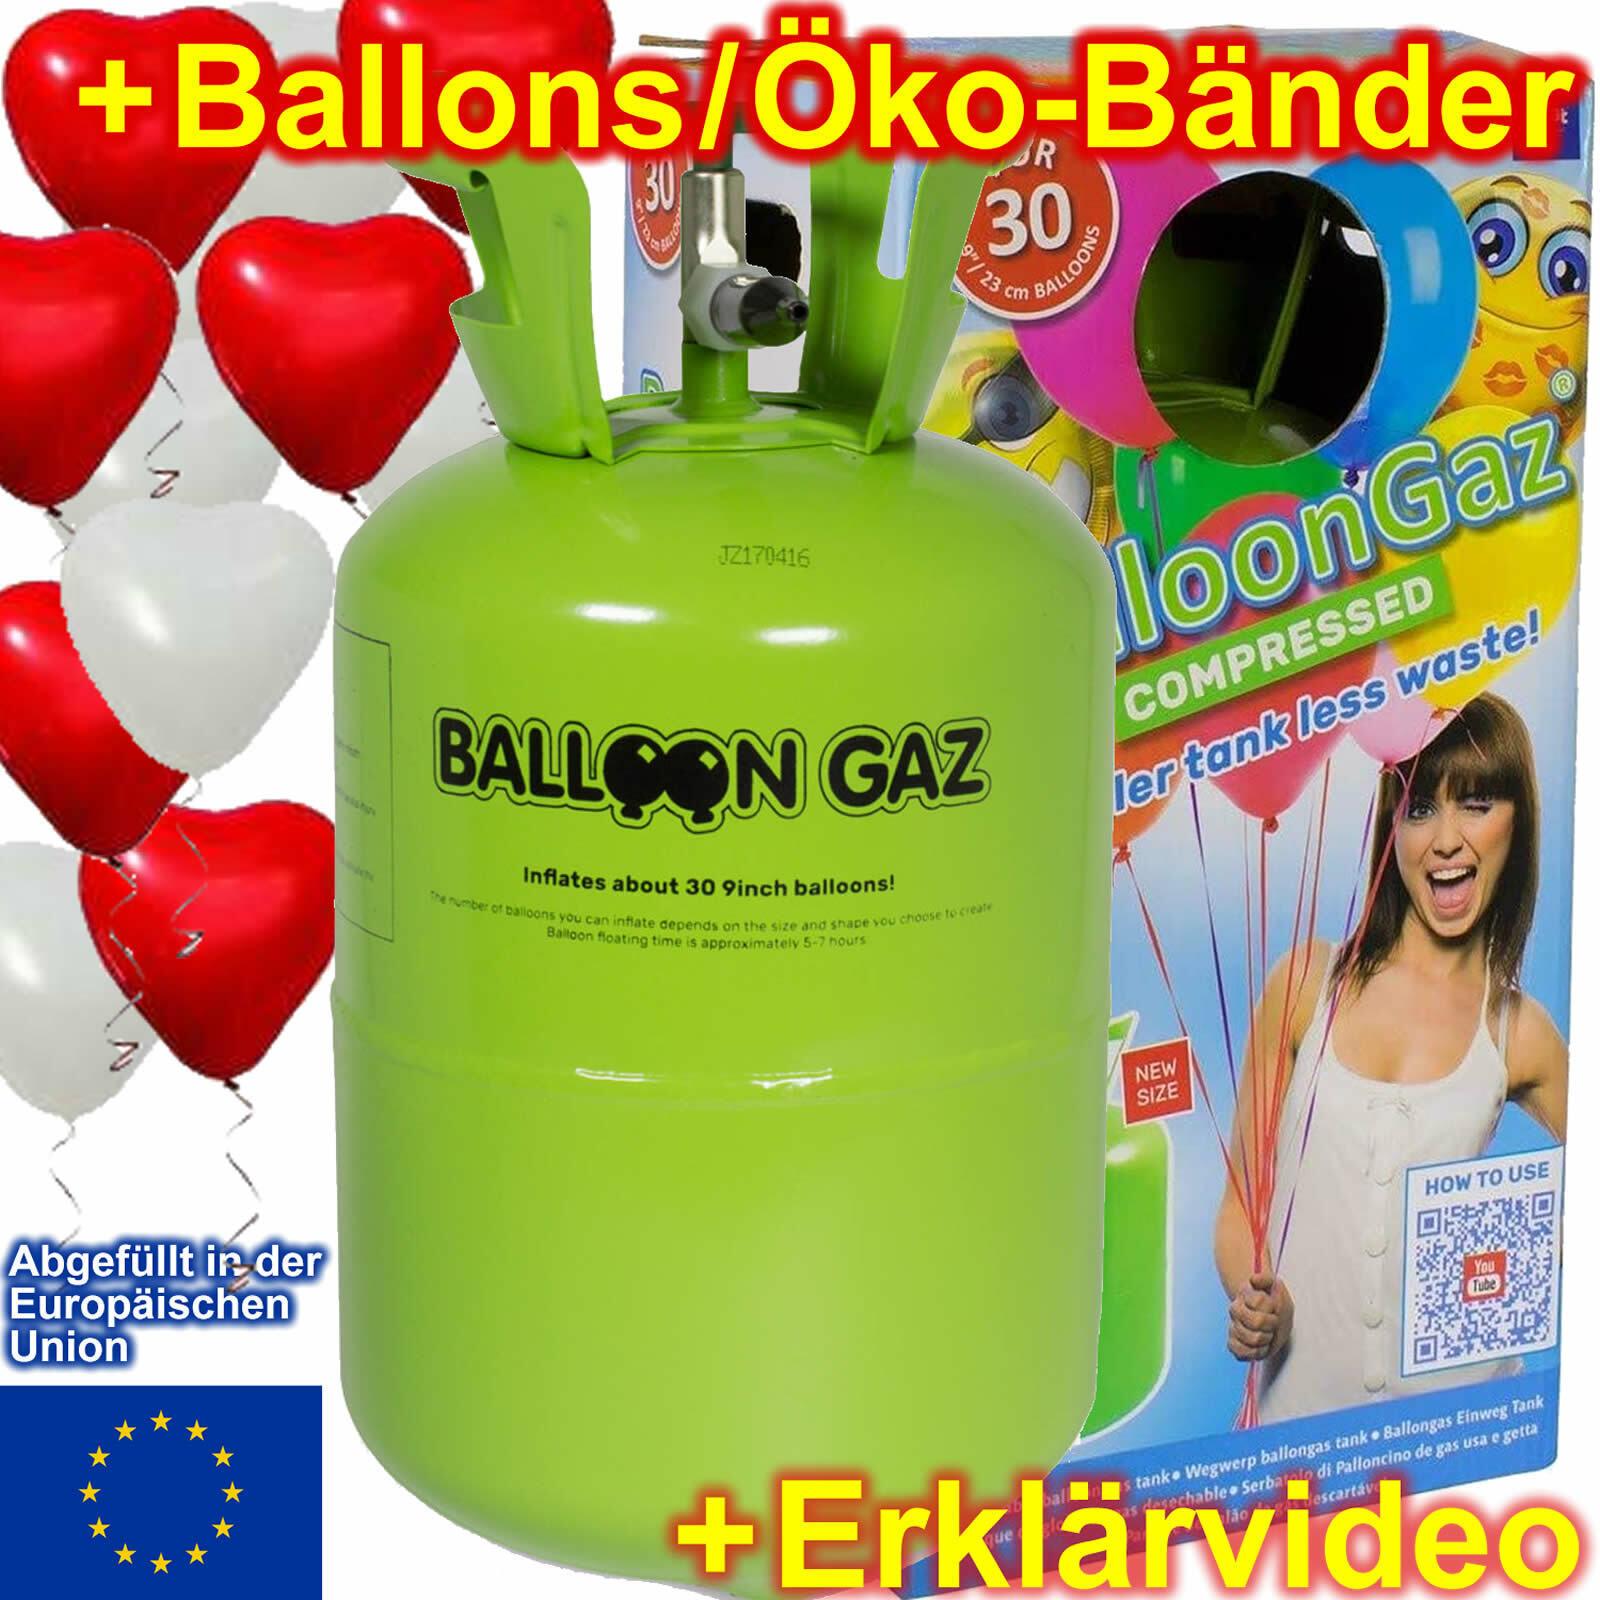 BALLONGAS HERZBALLONS BÄNDER - Helium Herzen Luftballons Party Hochzeit Deko